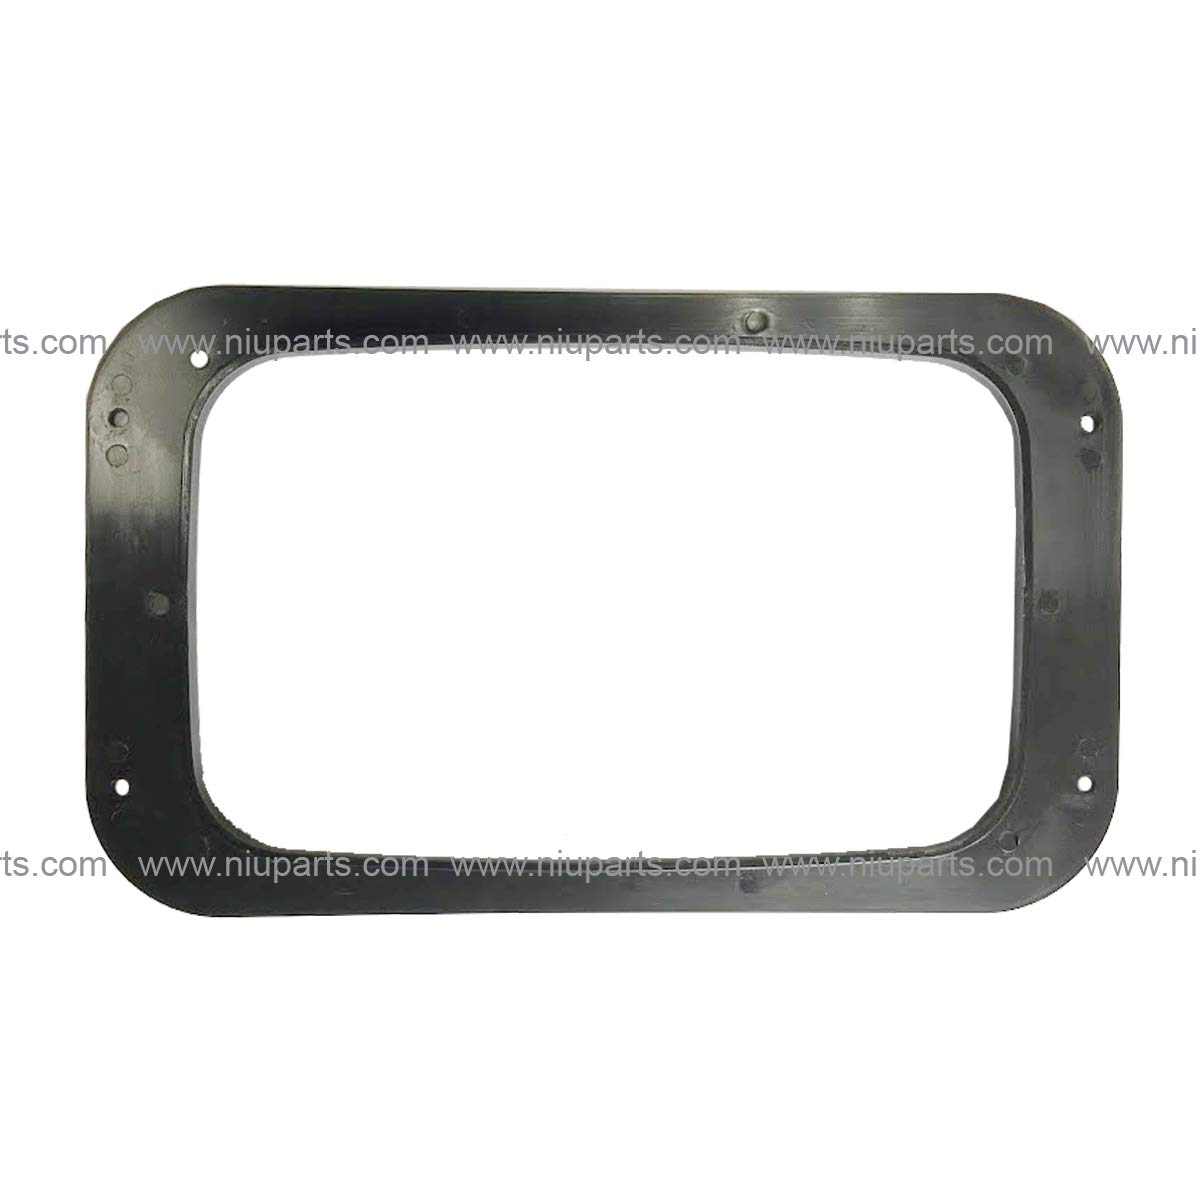 Fit: Mack RD 600 688 690S 1991-2004 Headlight Bezel Plastic Black